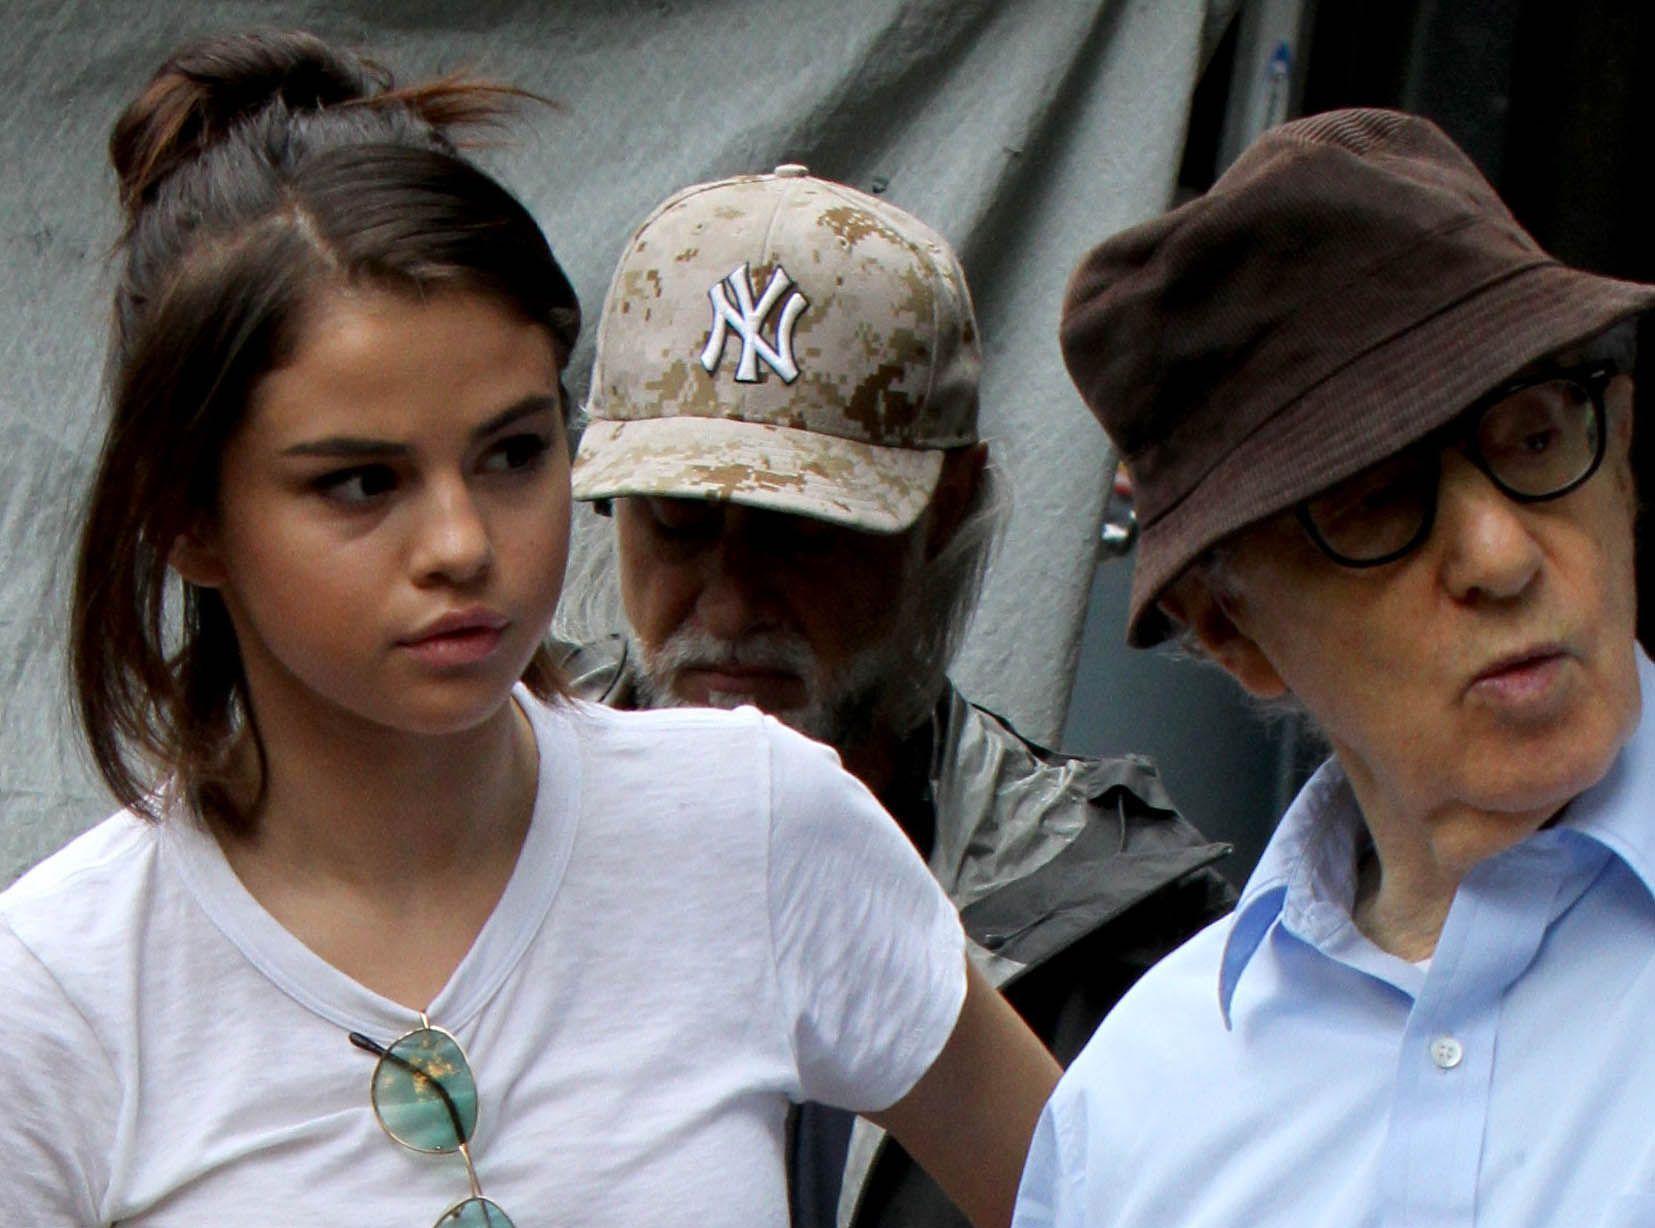 Est Justin toujours datant Selena Gomez